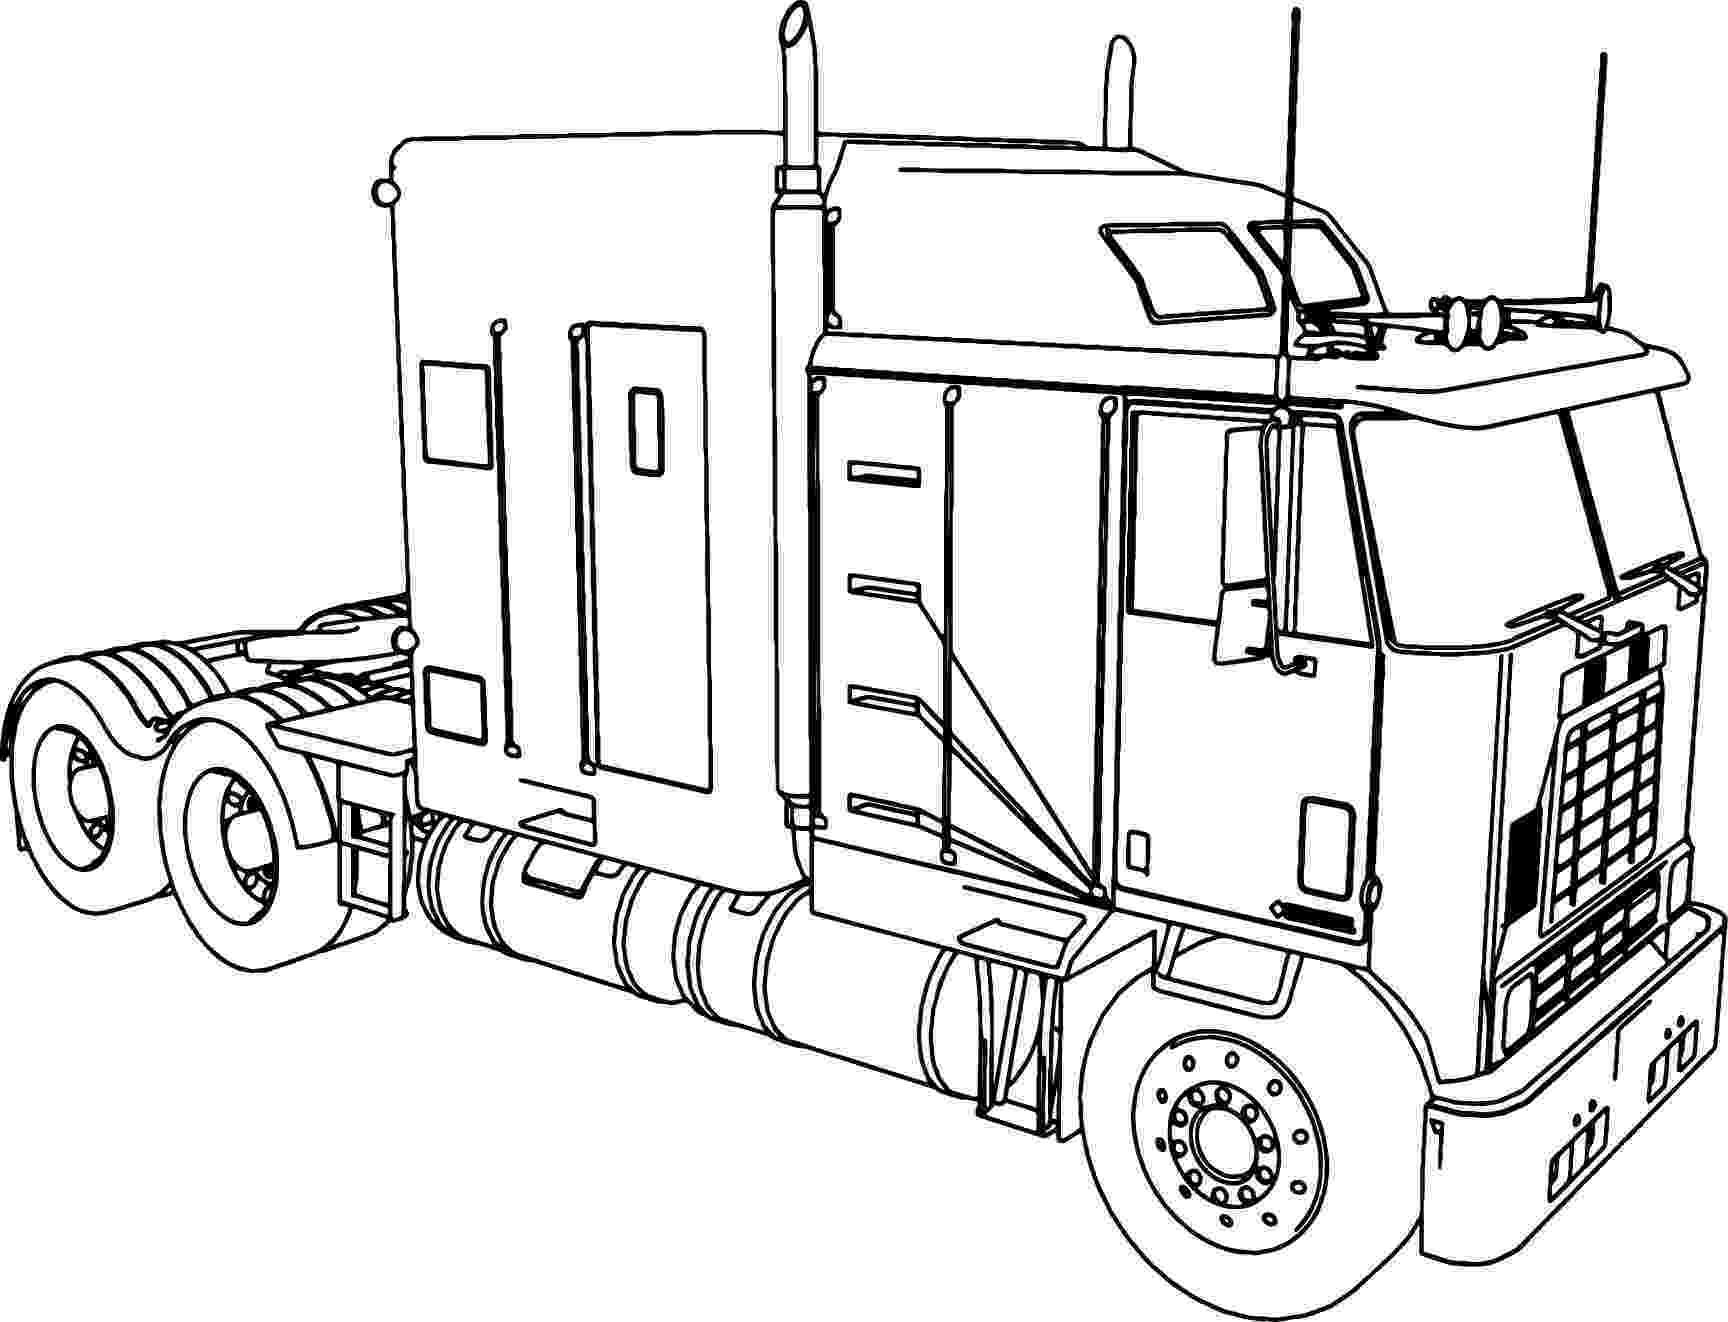 mack truck coloring pages truck coloring pages coloringrocks coloring mack truck pages